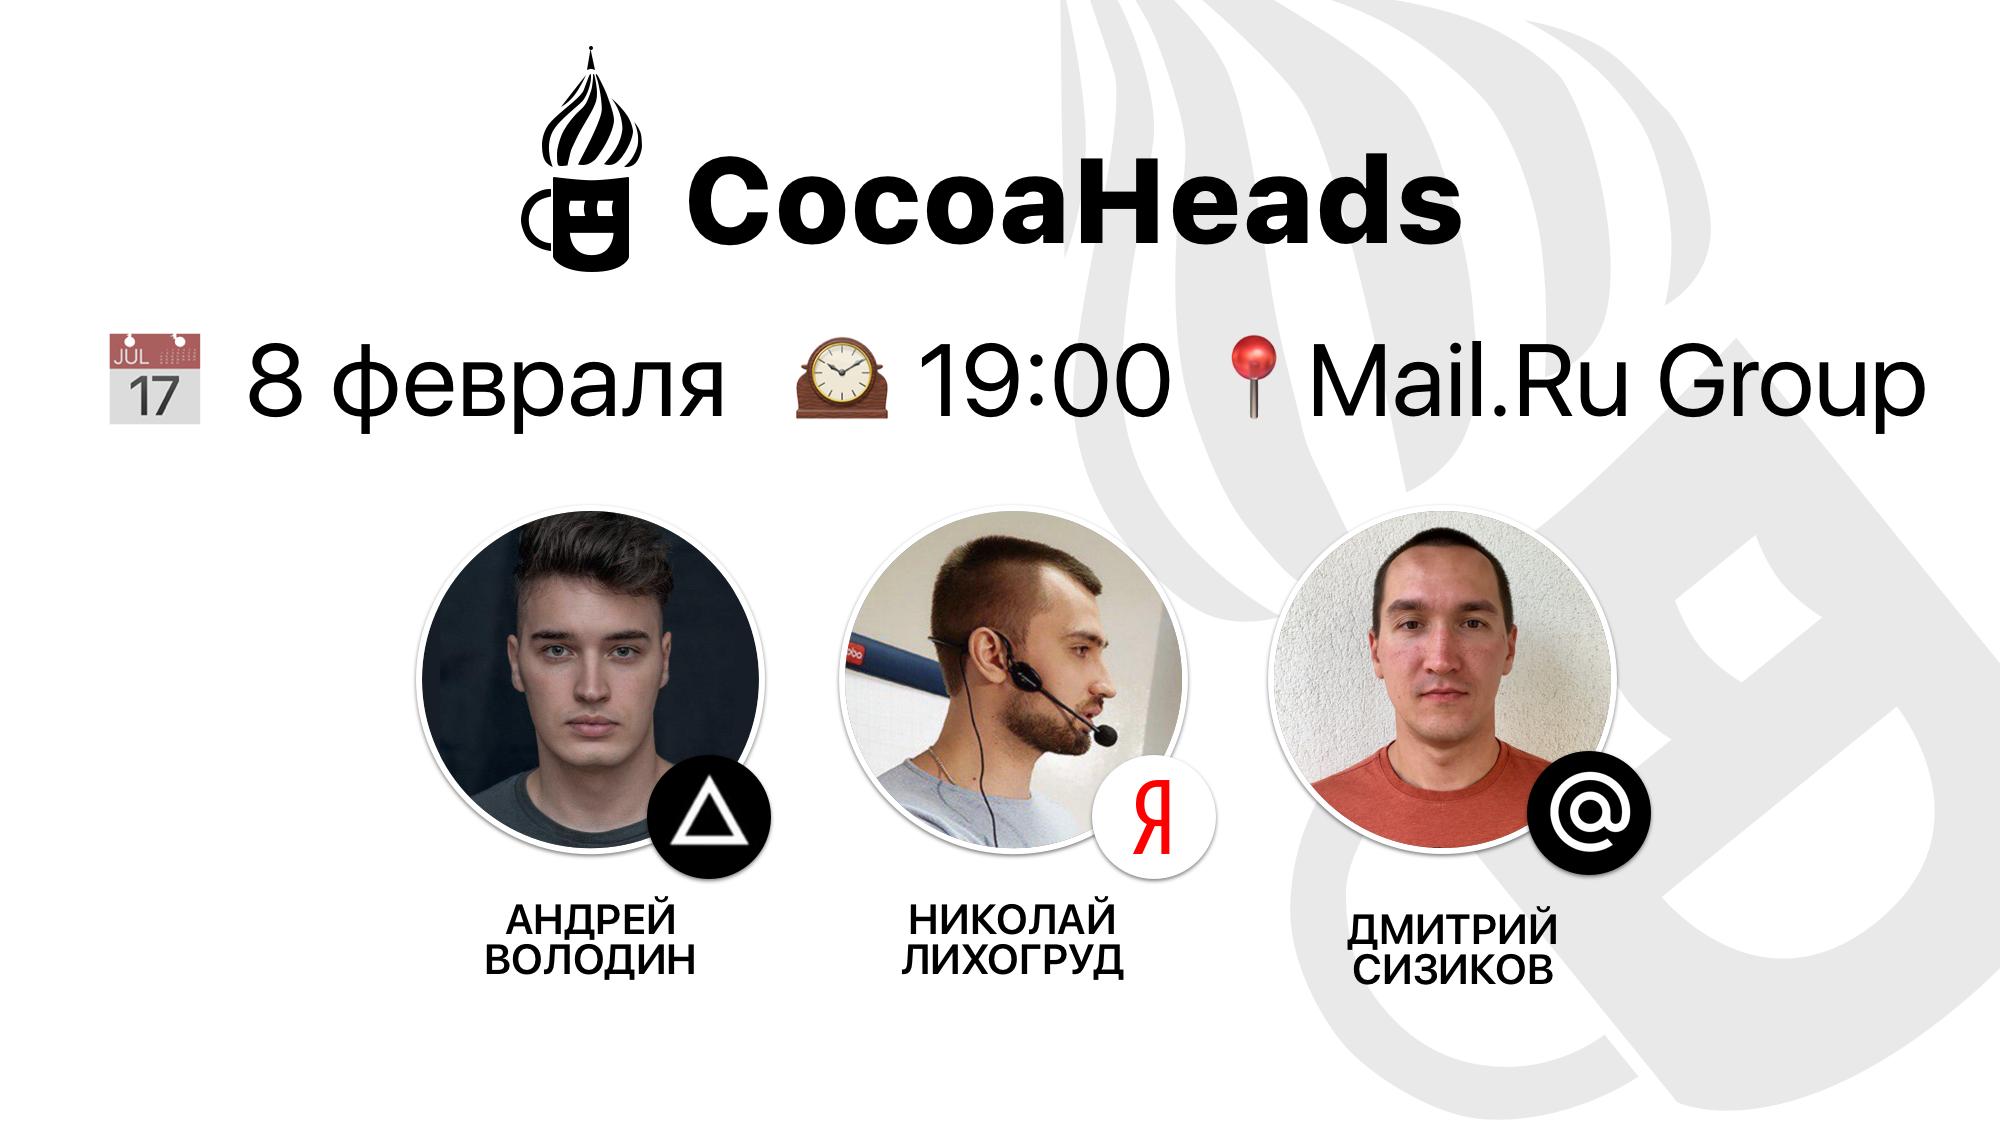 Ждём всех на очередном CocoaHeads Meetup - 1